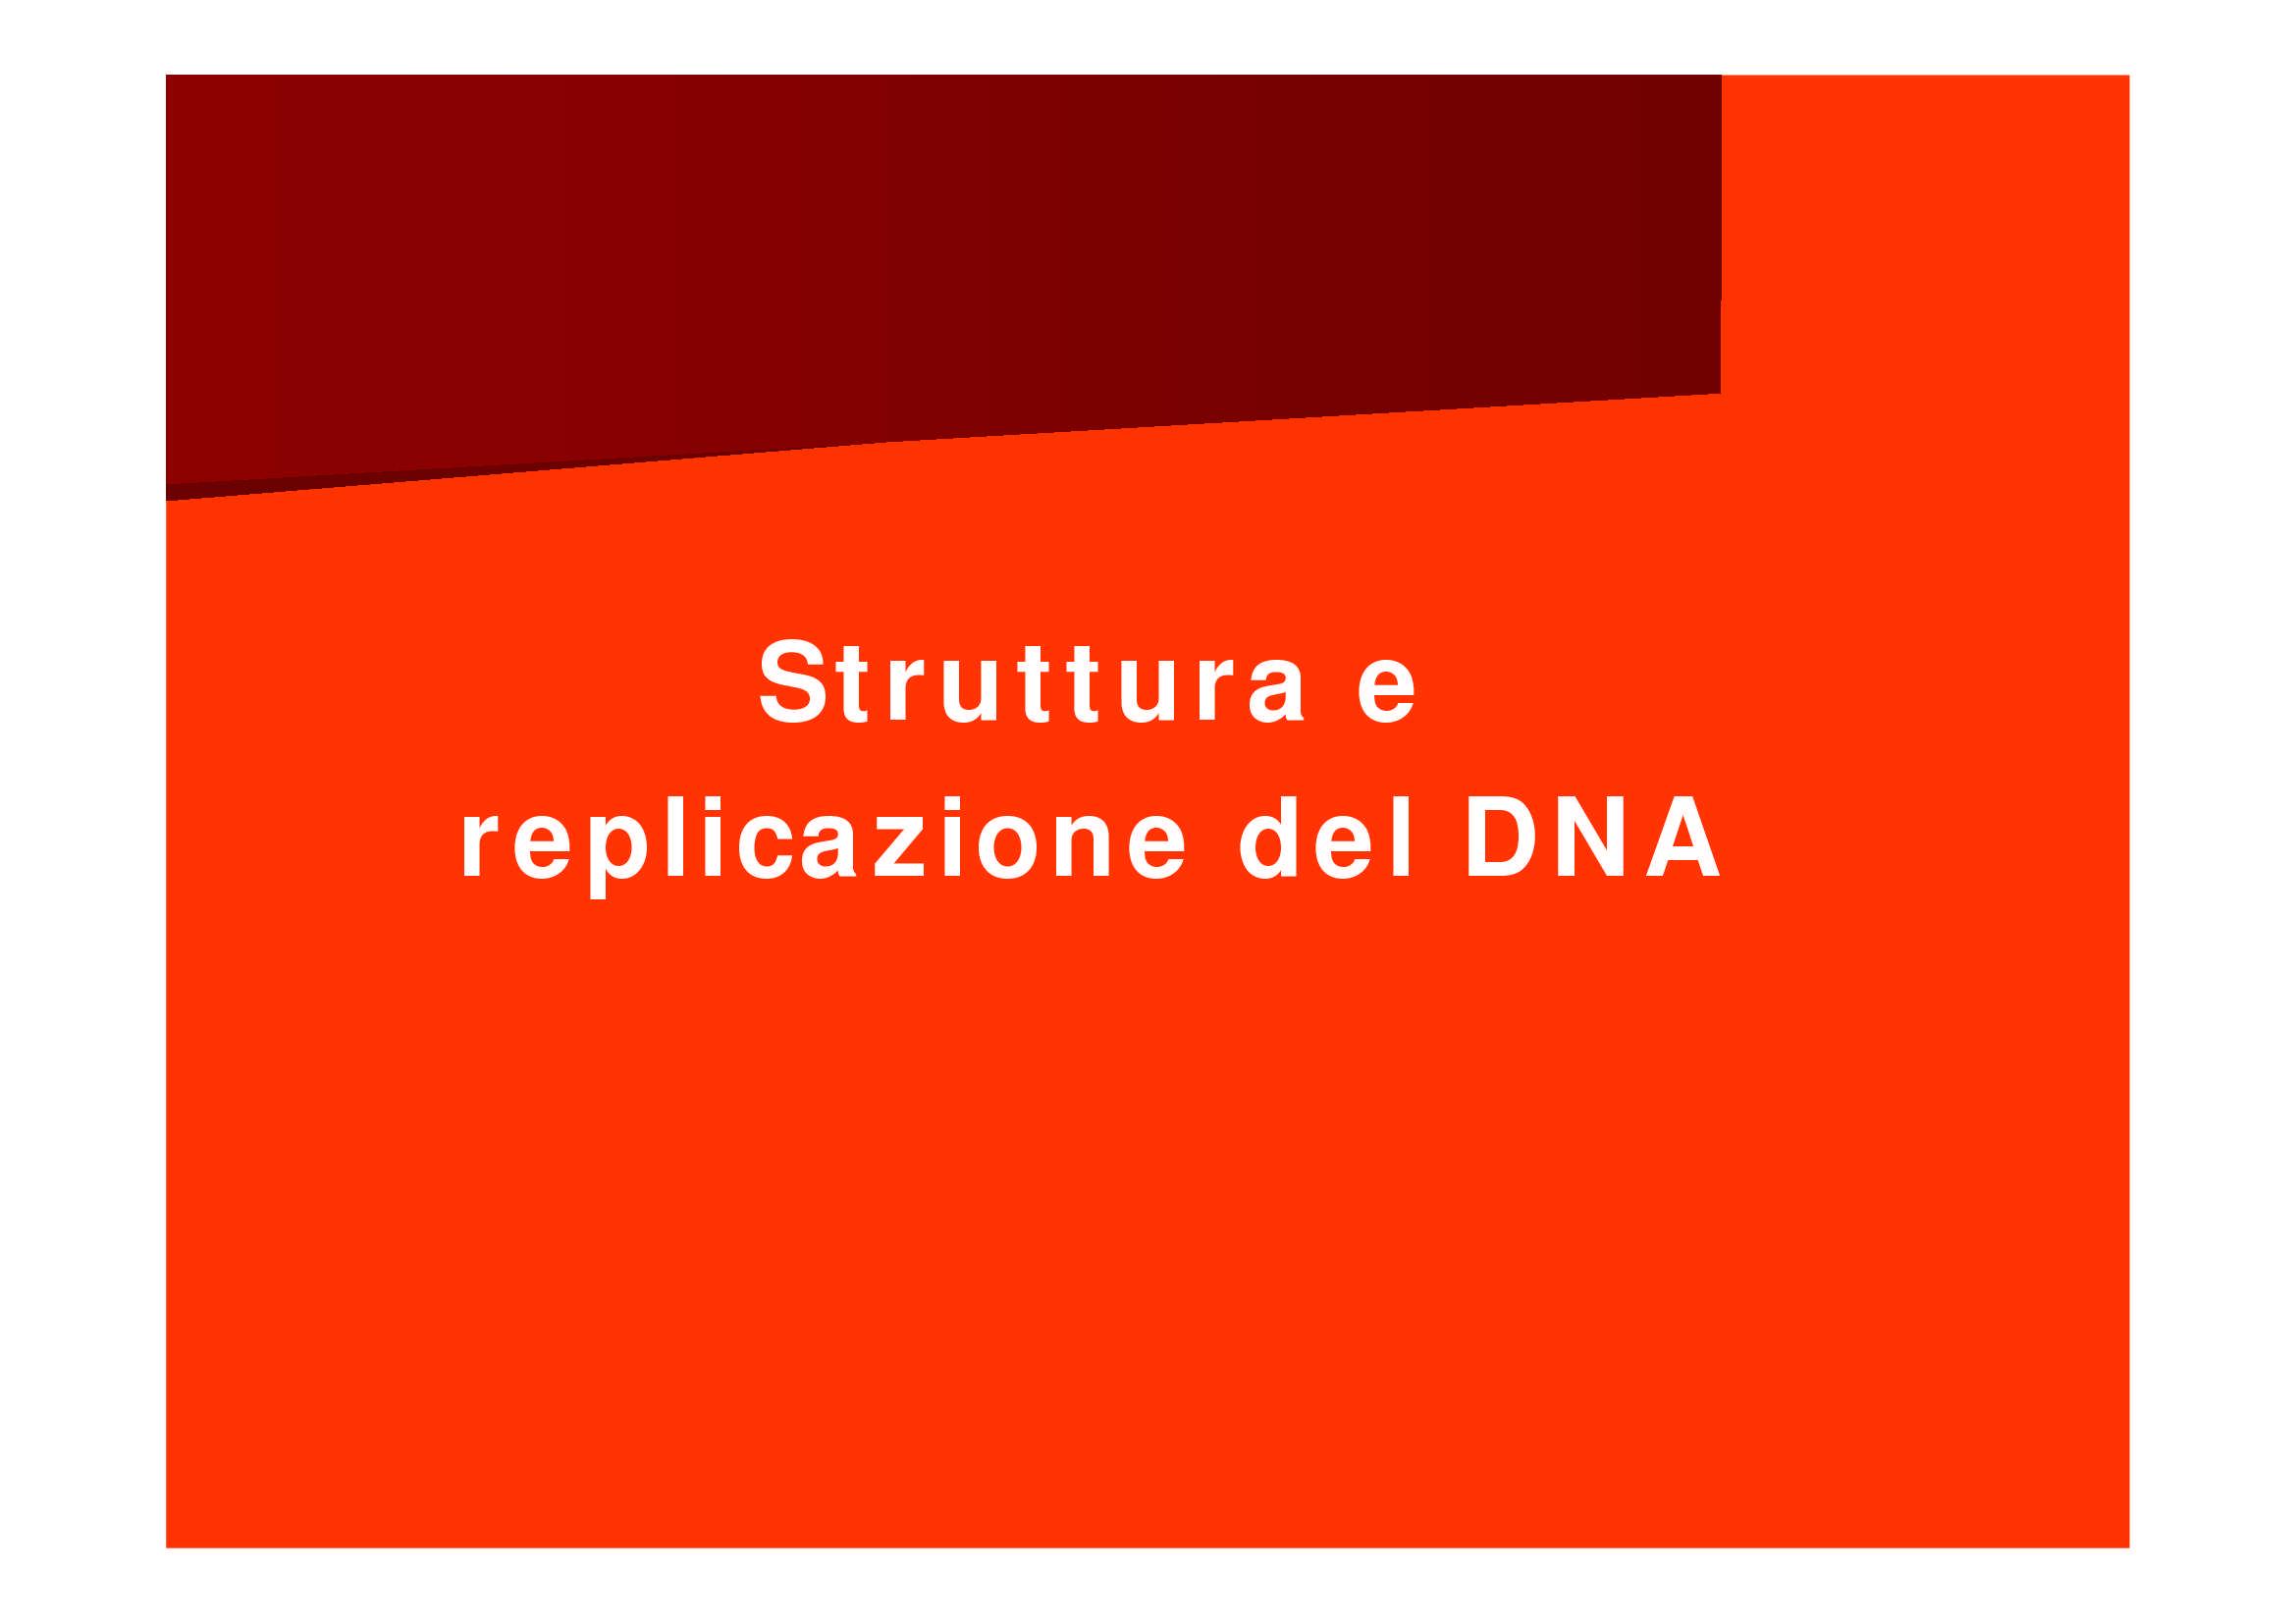 Struttura e replicazione DNA